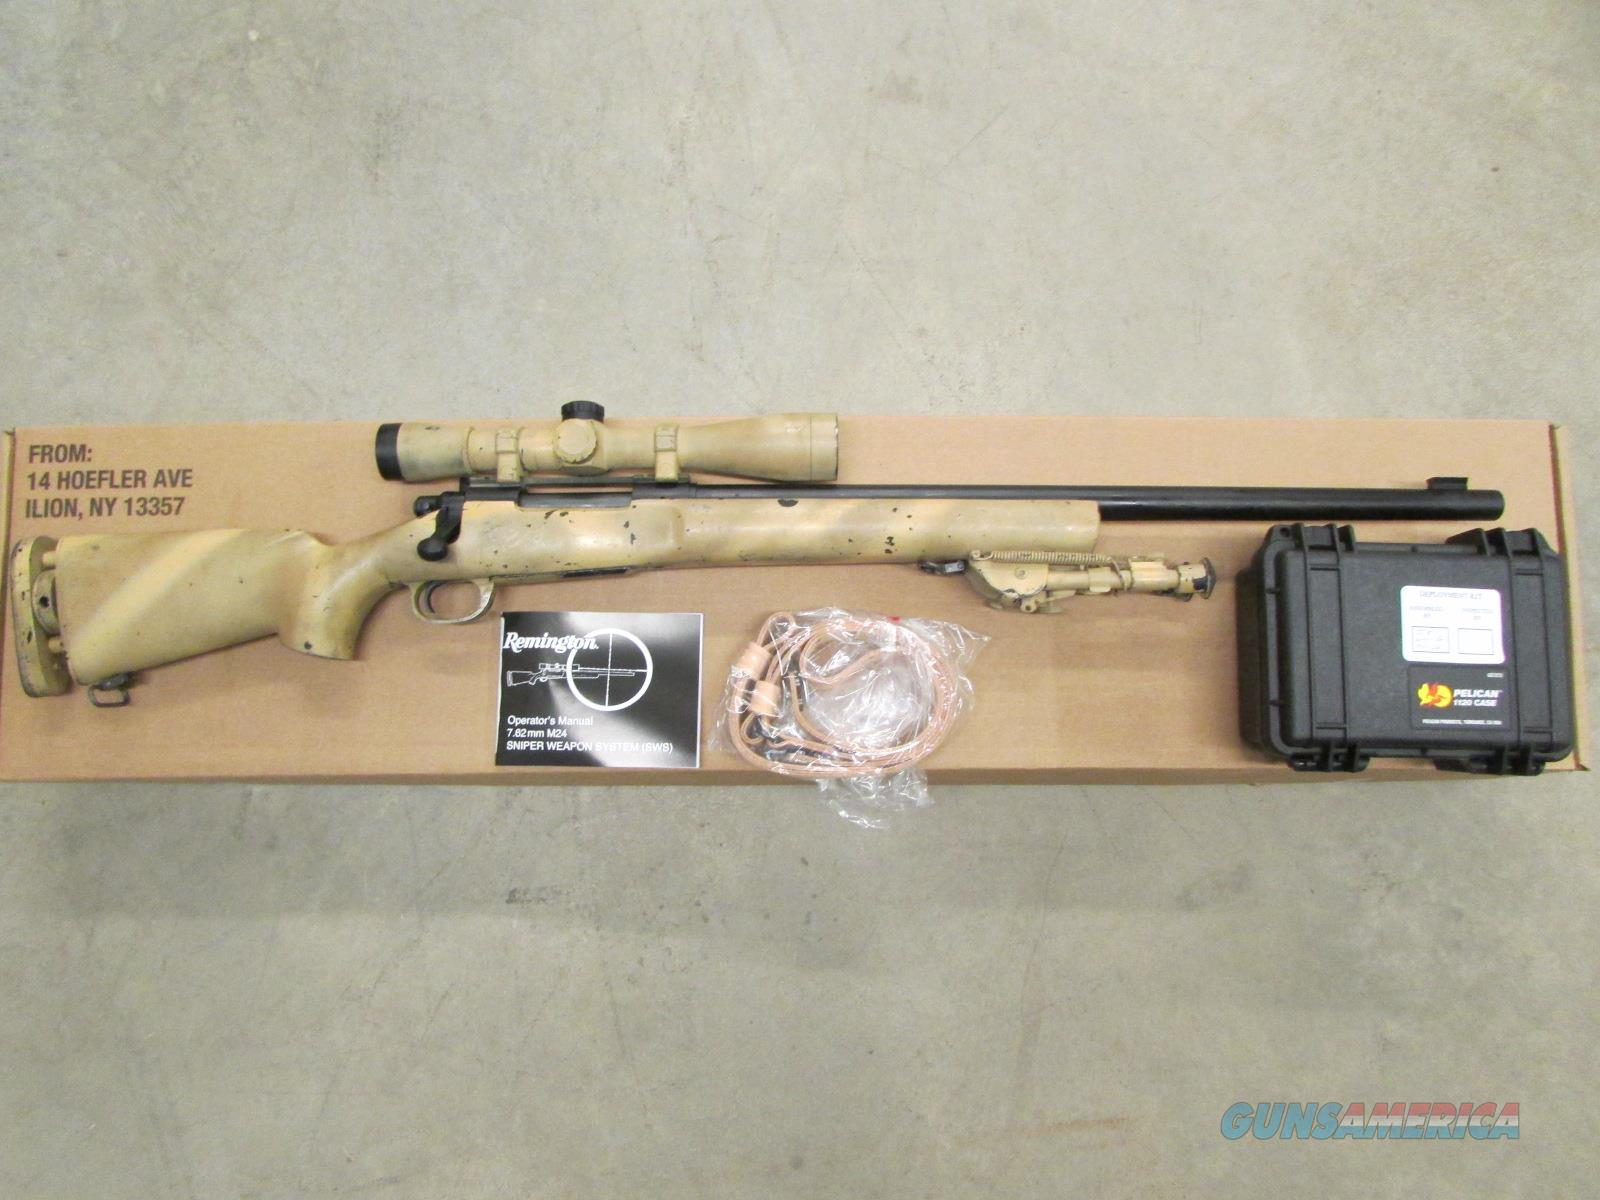 REMINGTON M24 SWS 7.62 NATO MILITARY BRING-BACK... for sale